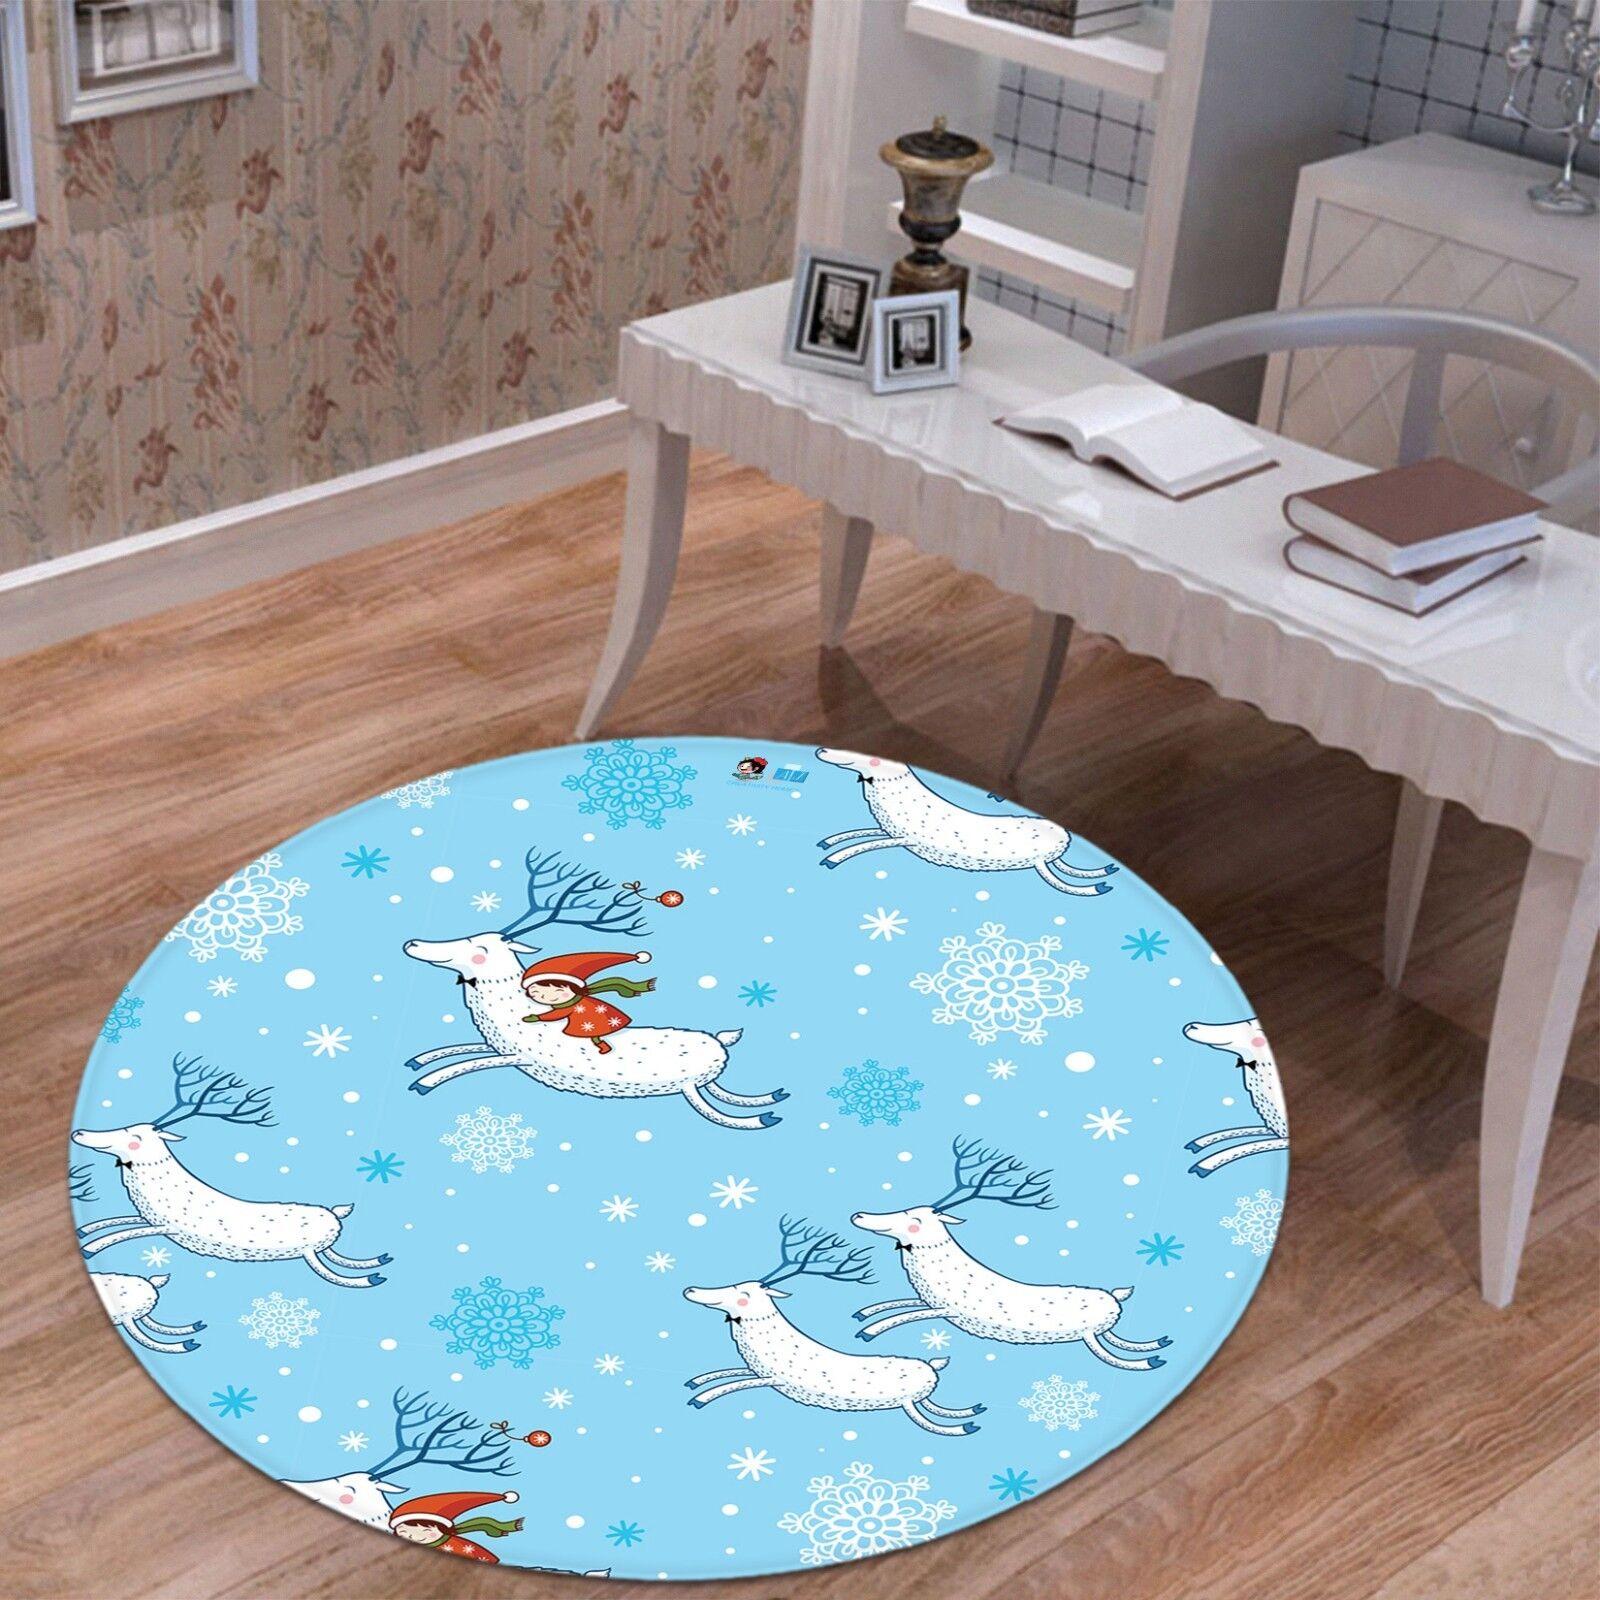 3d Natale Xmas 655 antiscivolo tappeto tappetino vano giri elegante TAPPETO de